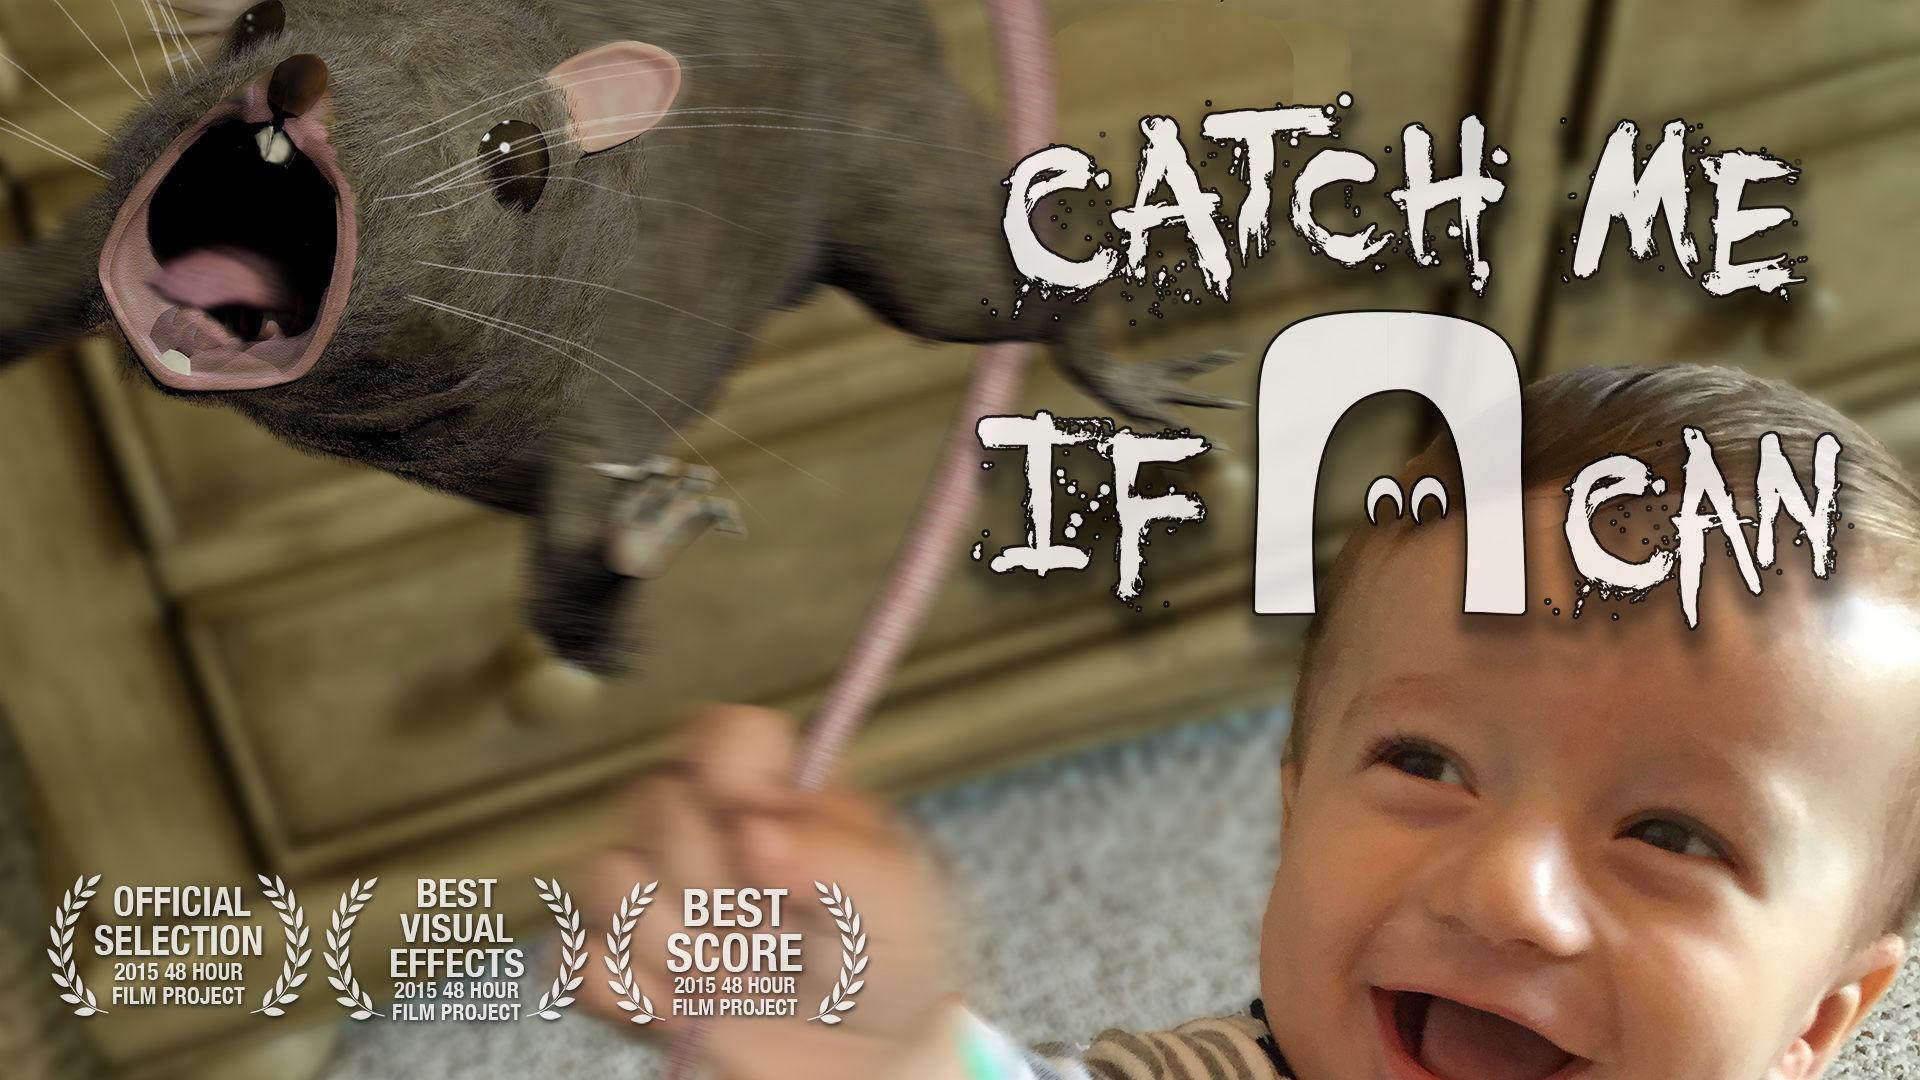 Catch Me if U Can (2015)